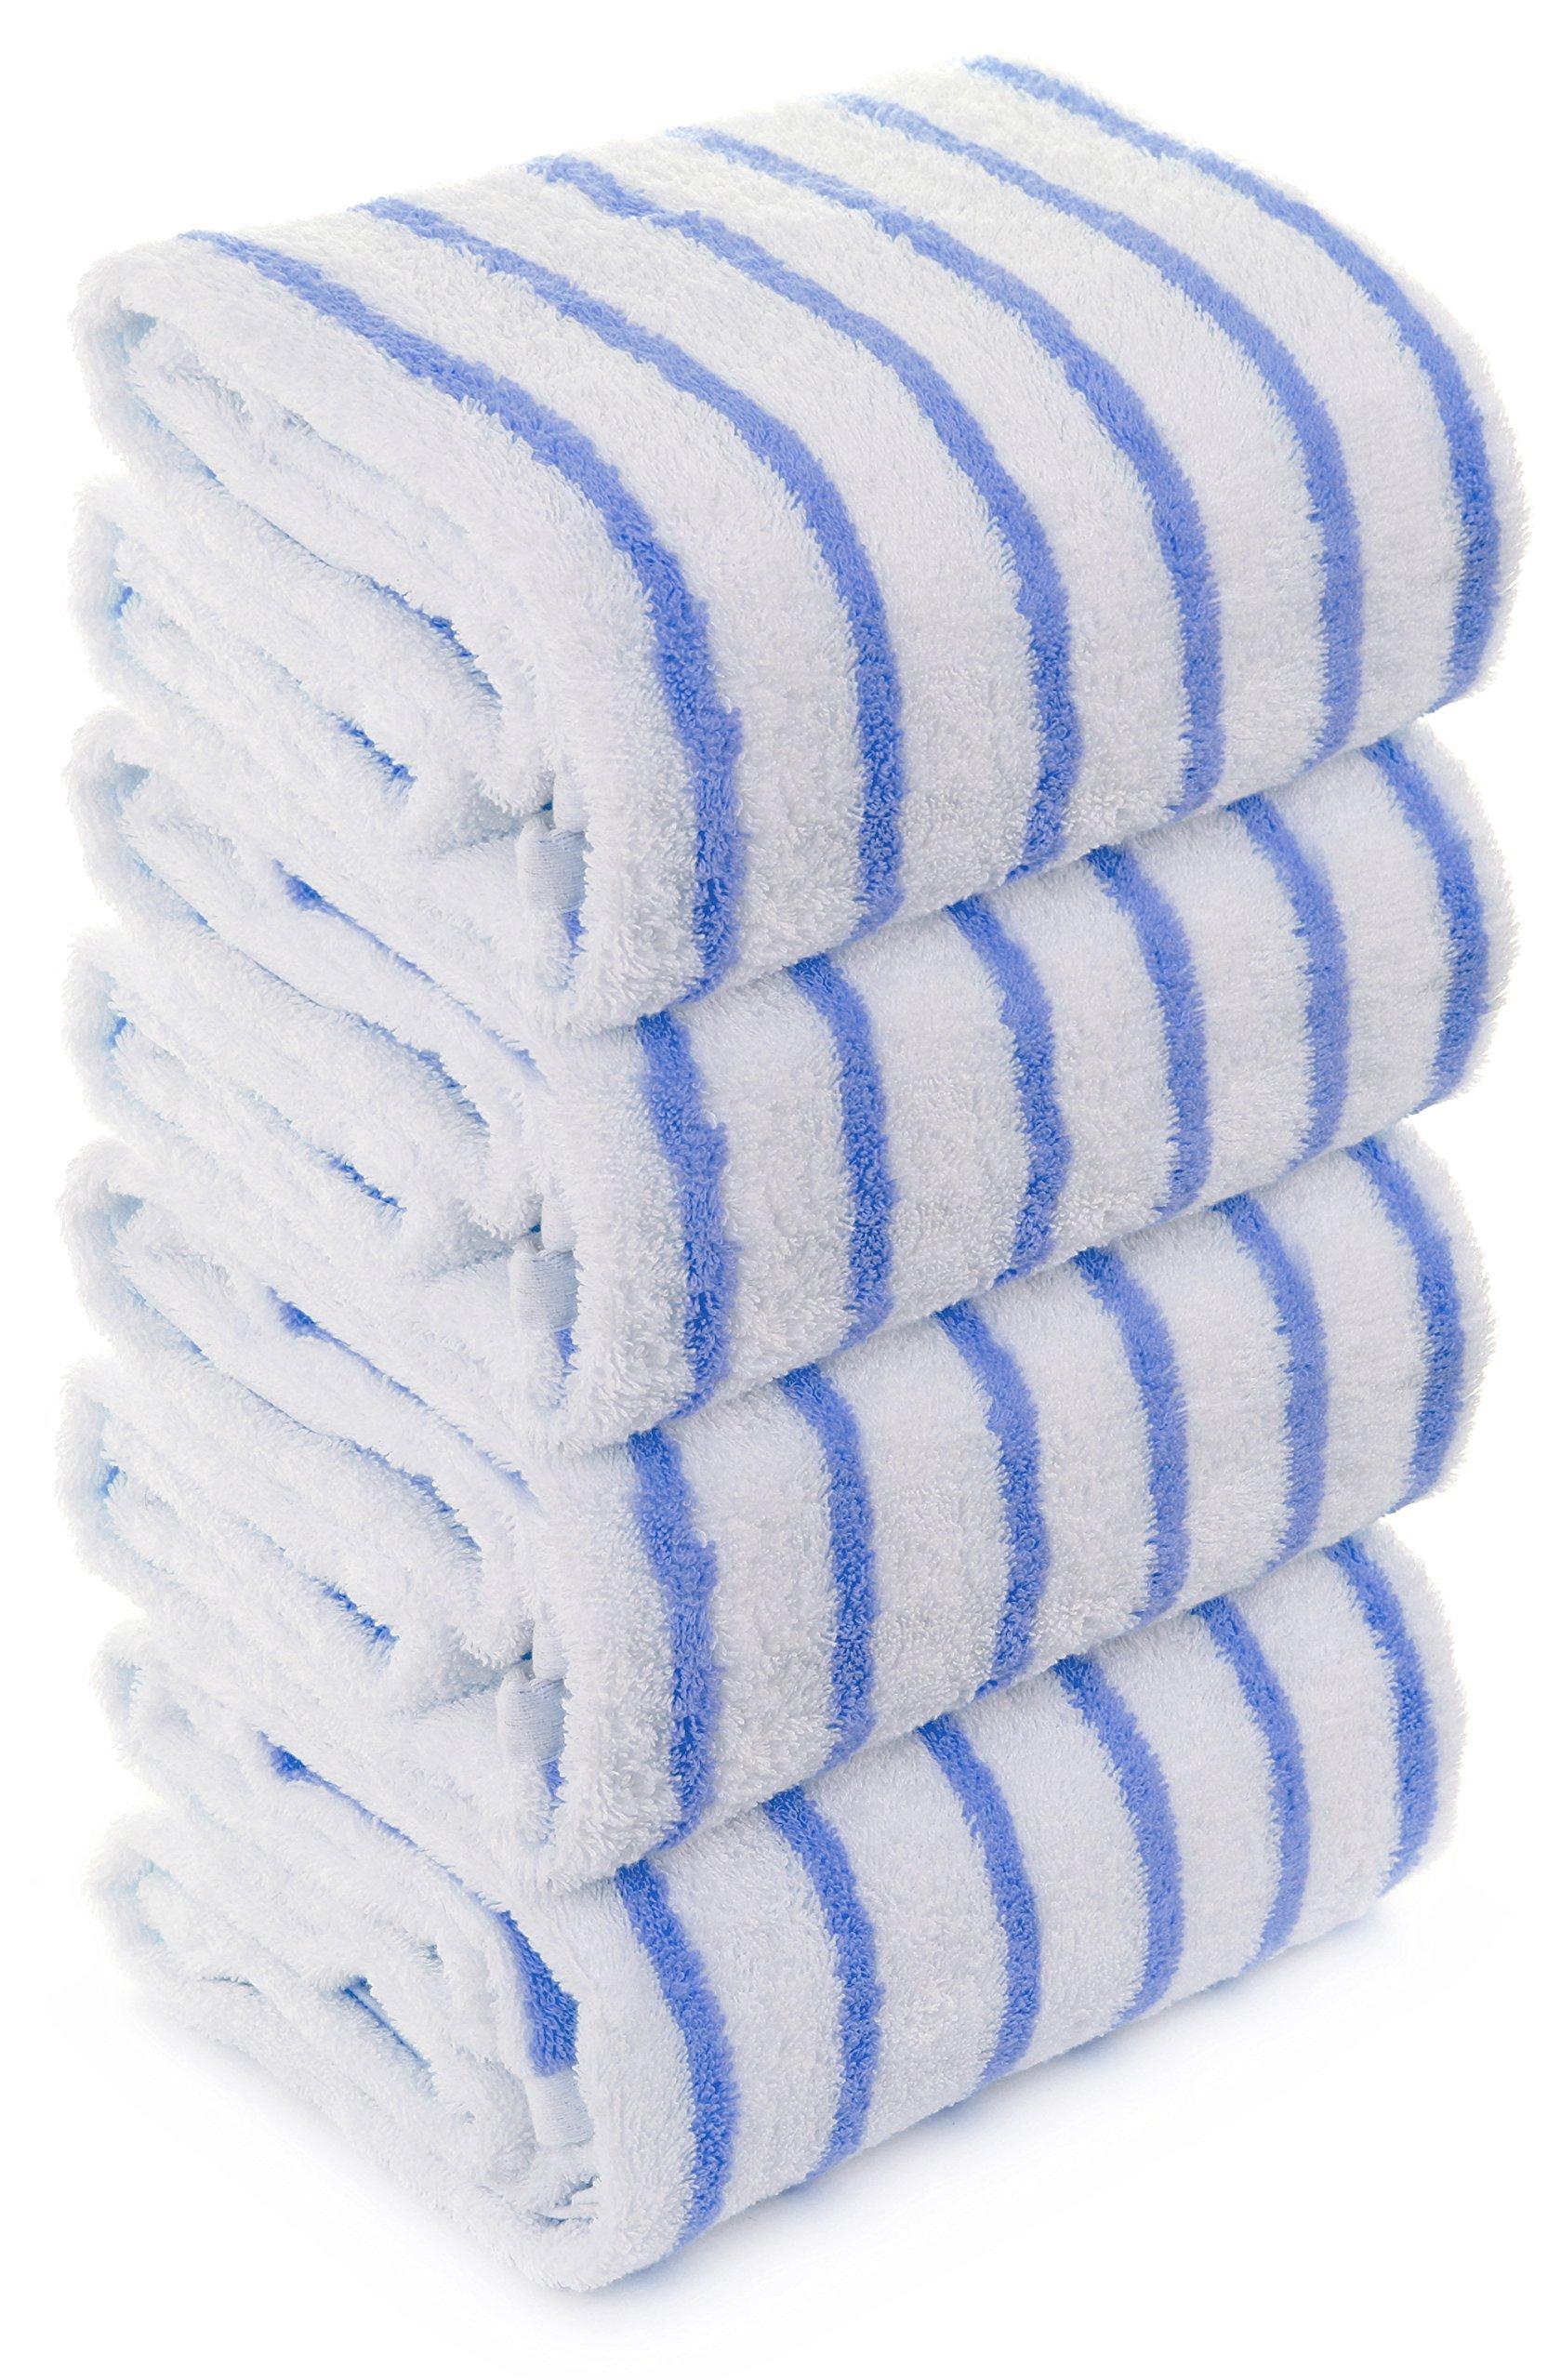 Turkuoise Thin Cabana Stripe Towel - 1